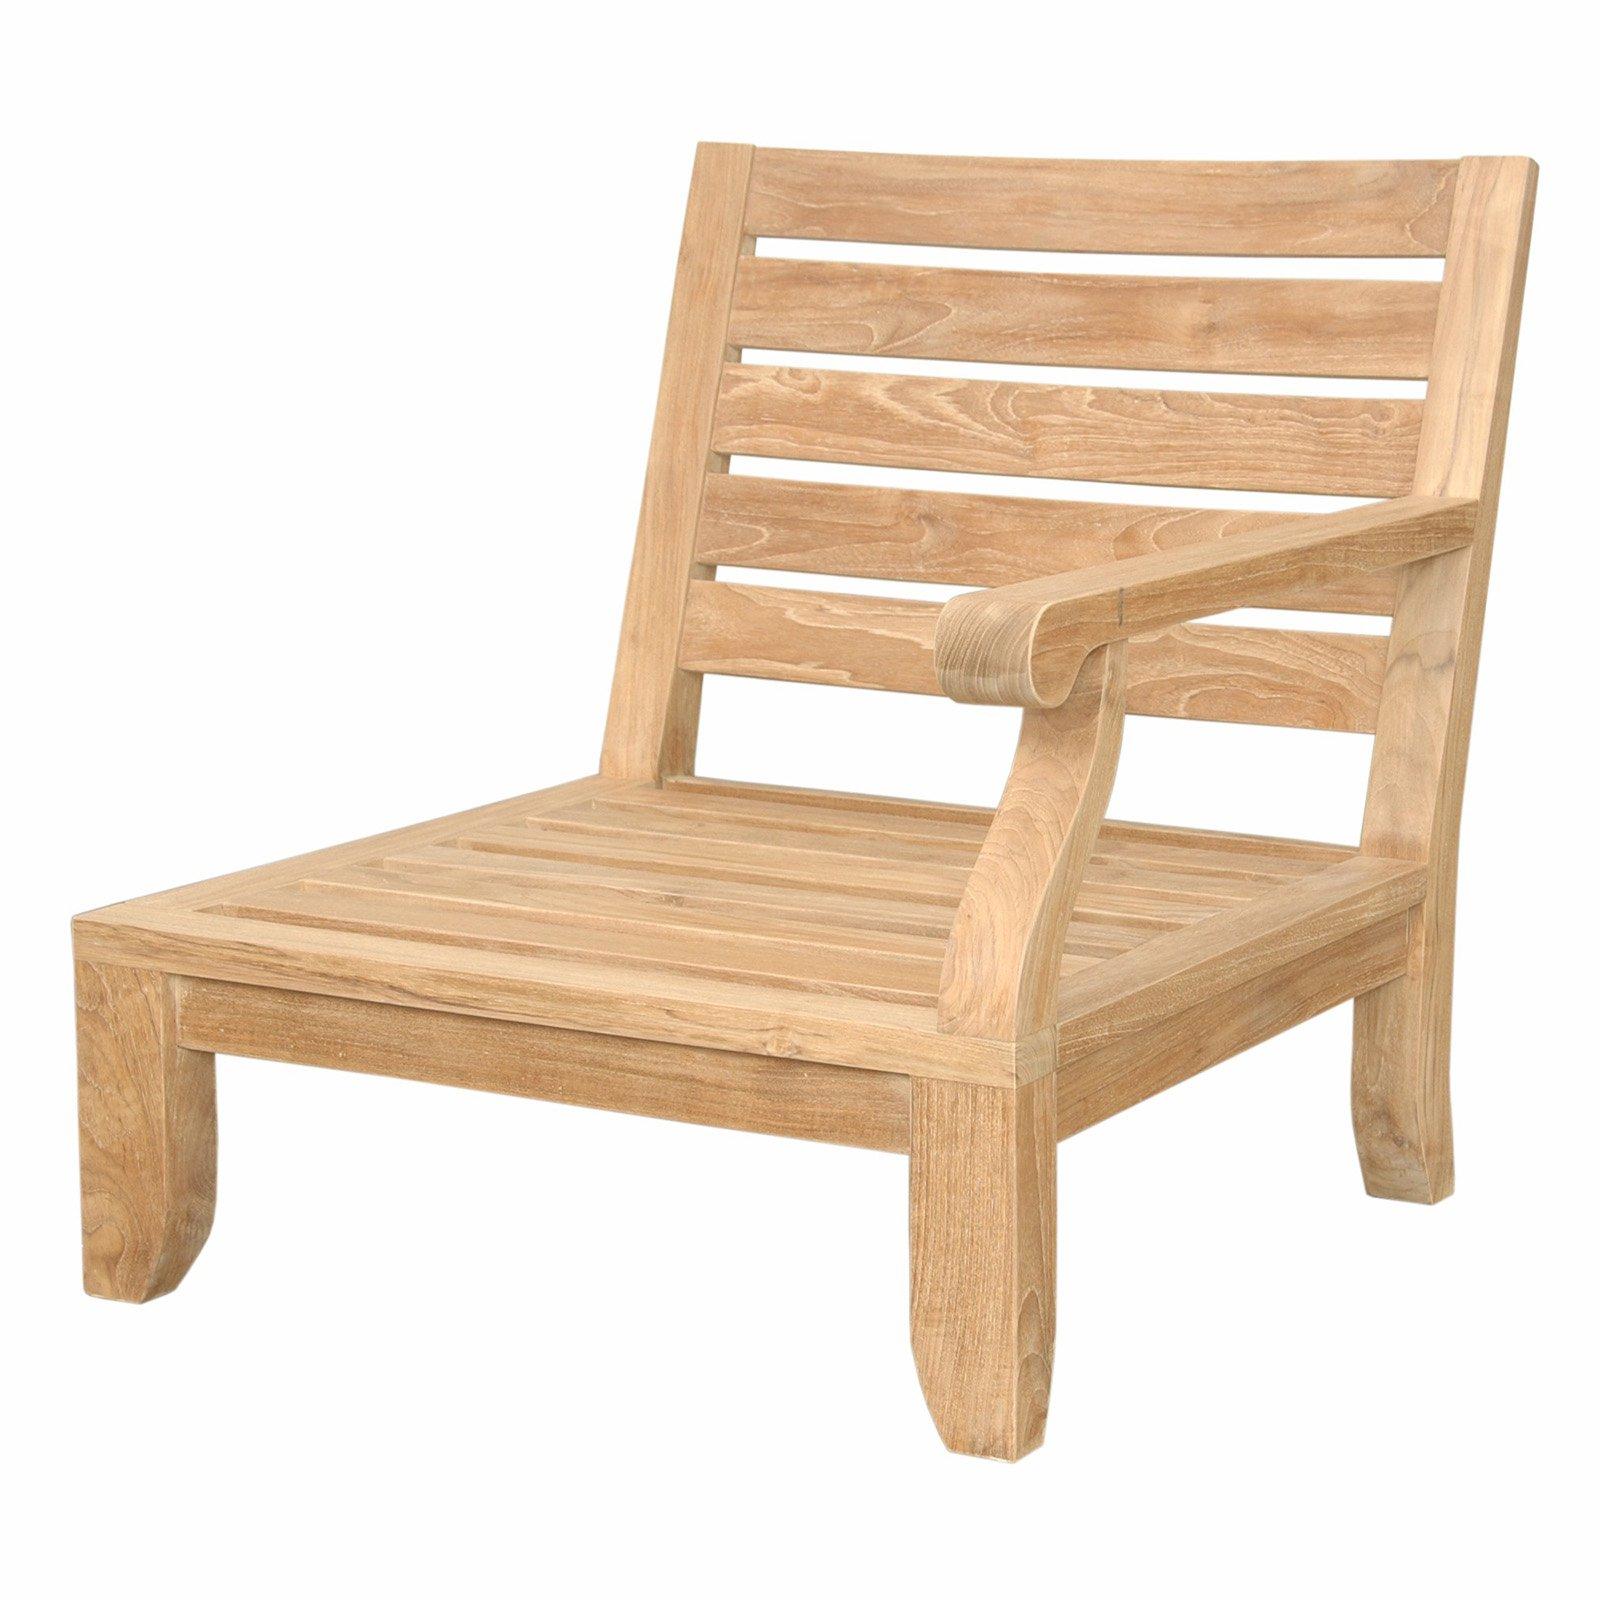 Anderson Teak Riviera Luxe Left Facing Outdoor Modular Chair